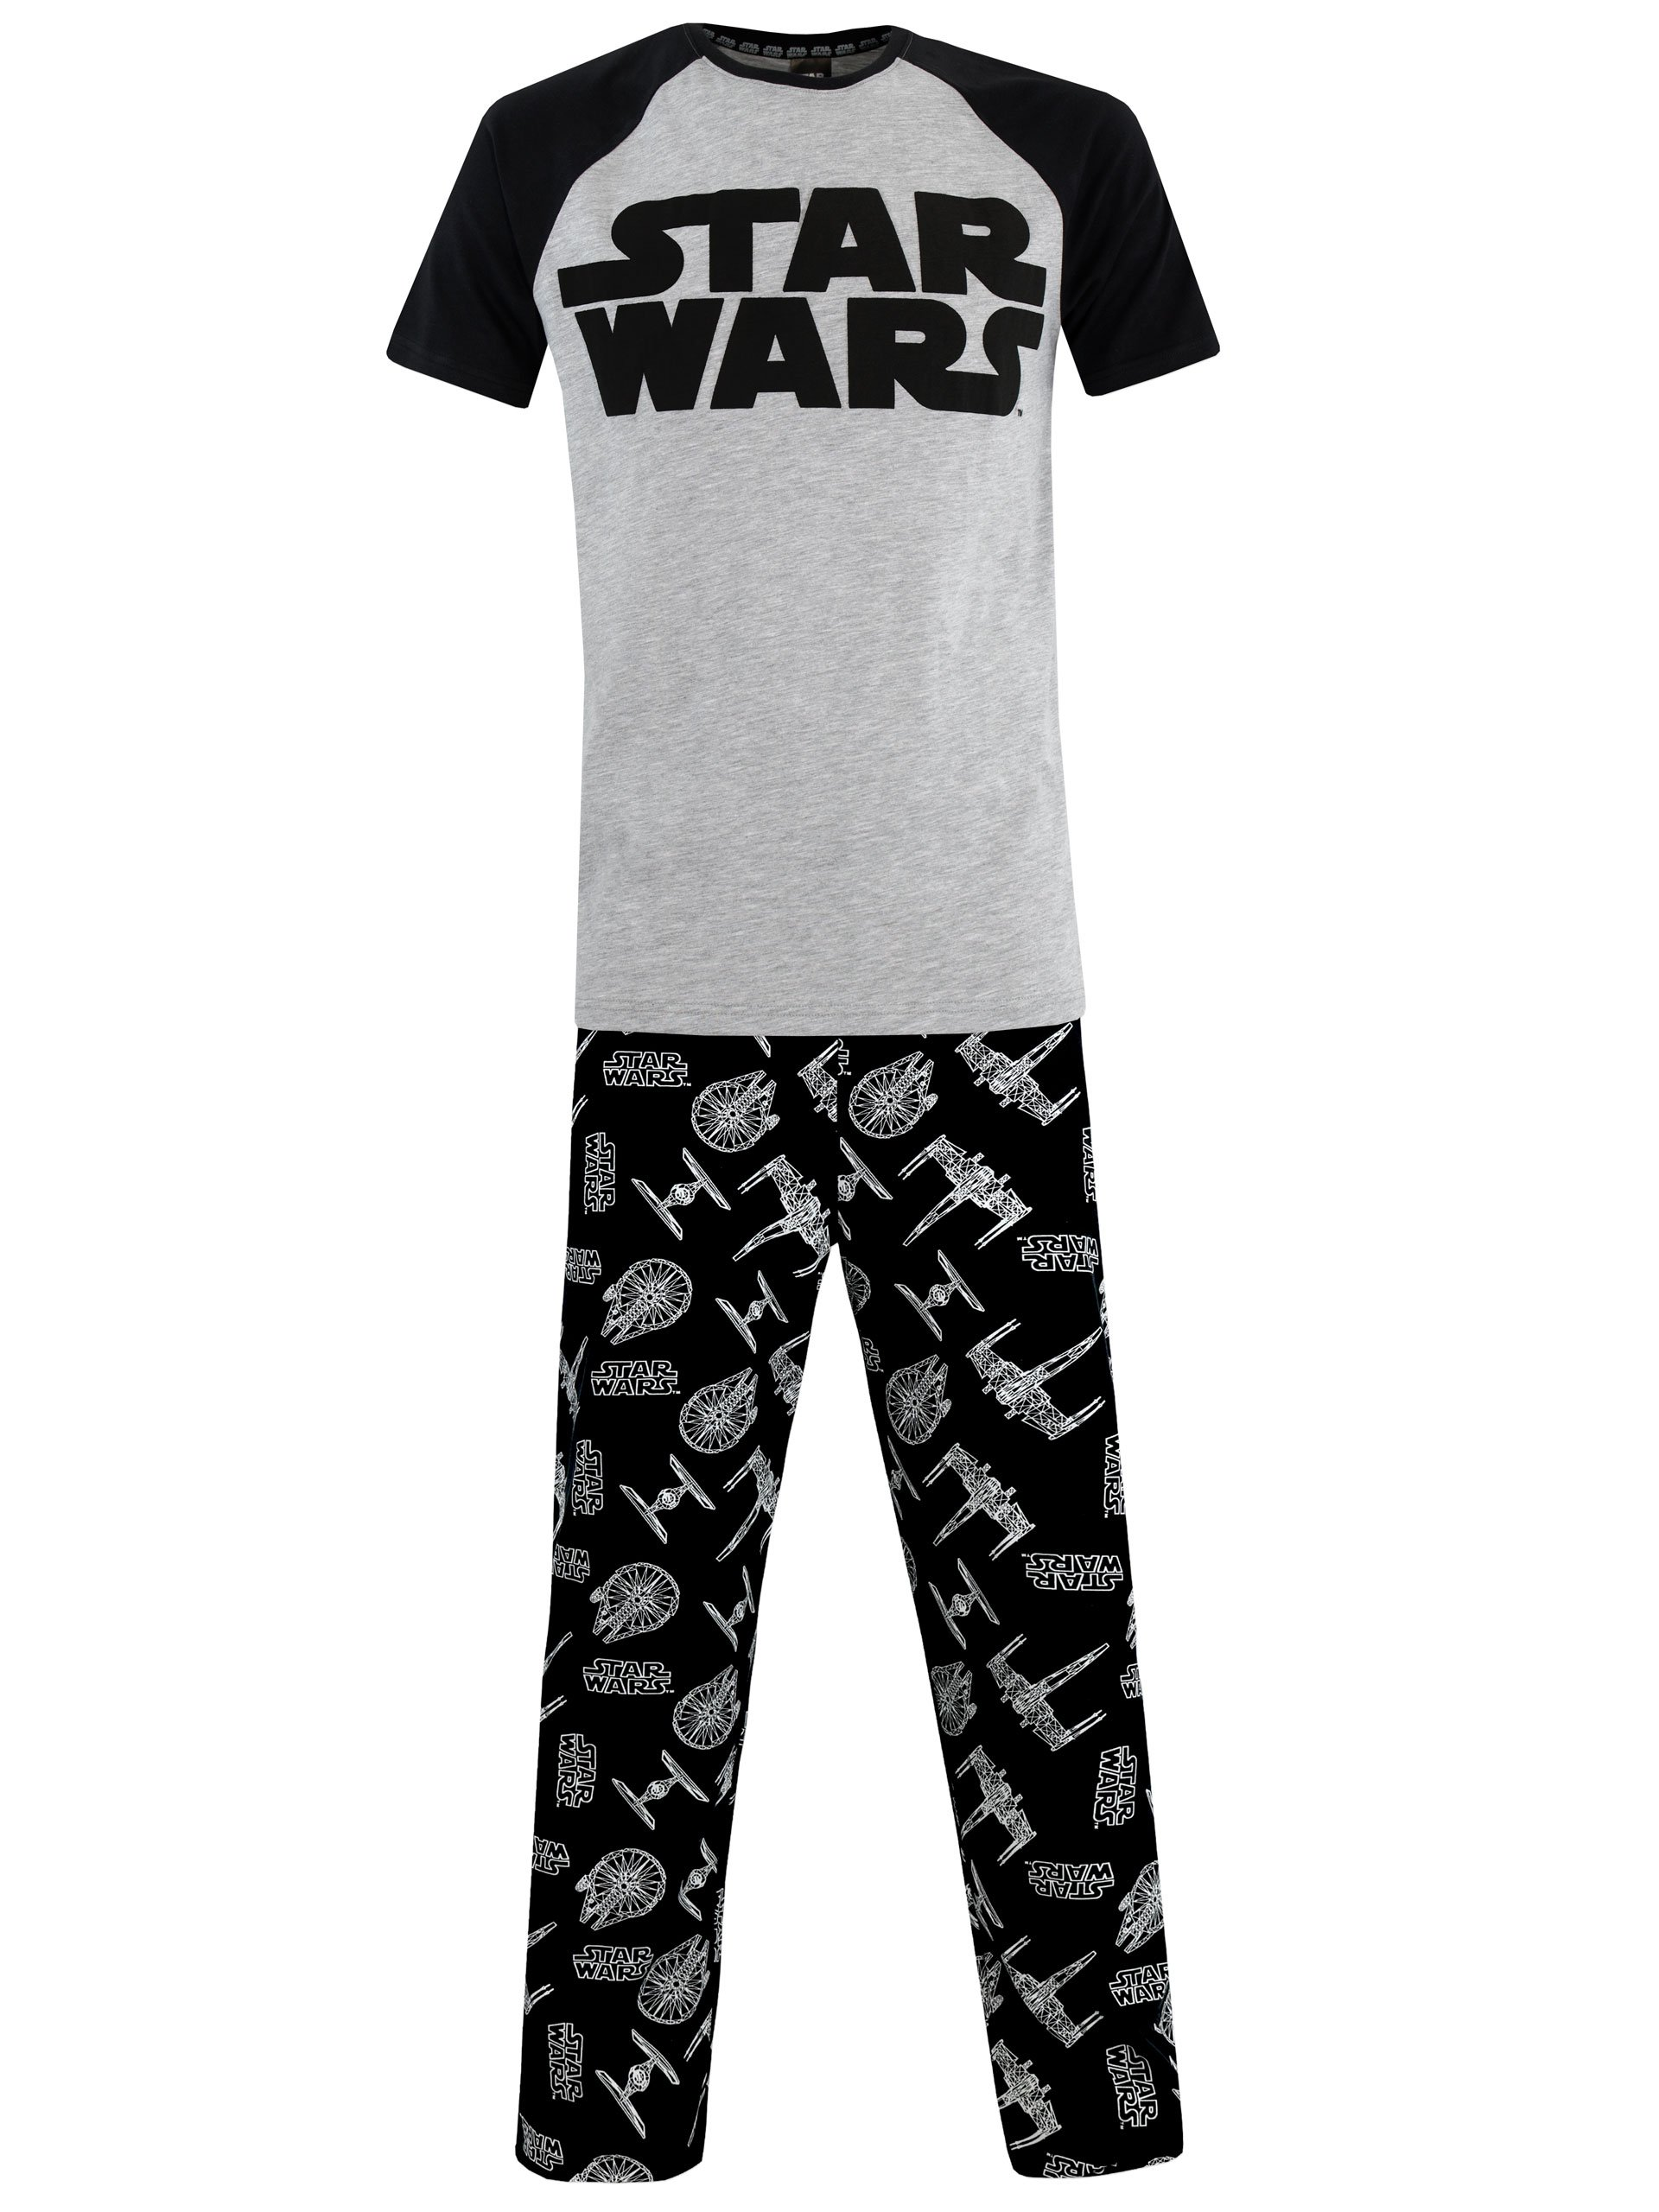 Star Wars - Pijama para Hombre - Star Wars product image